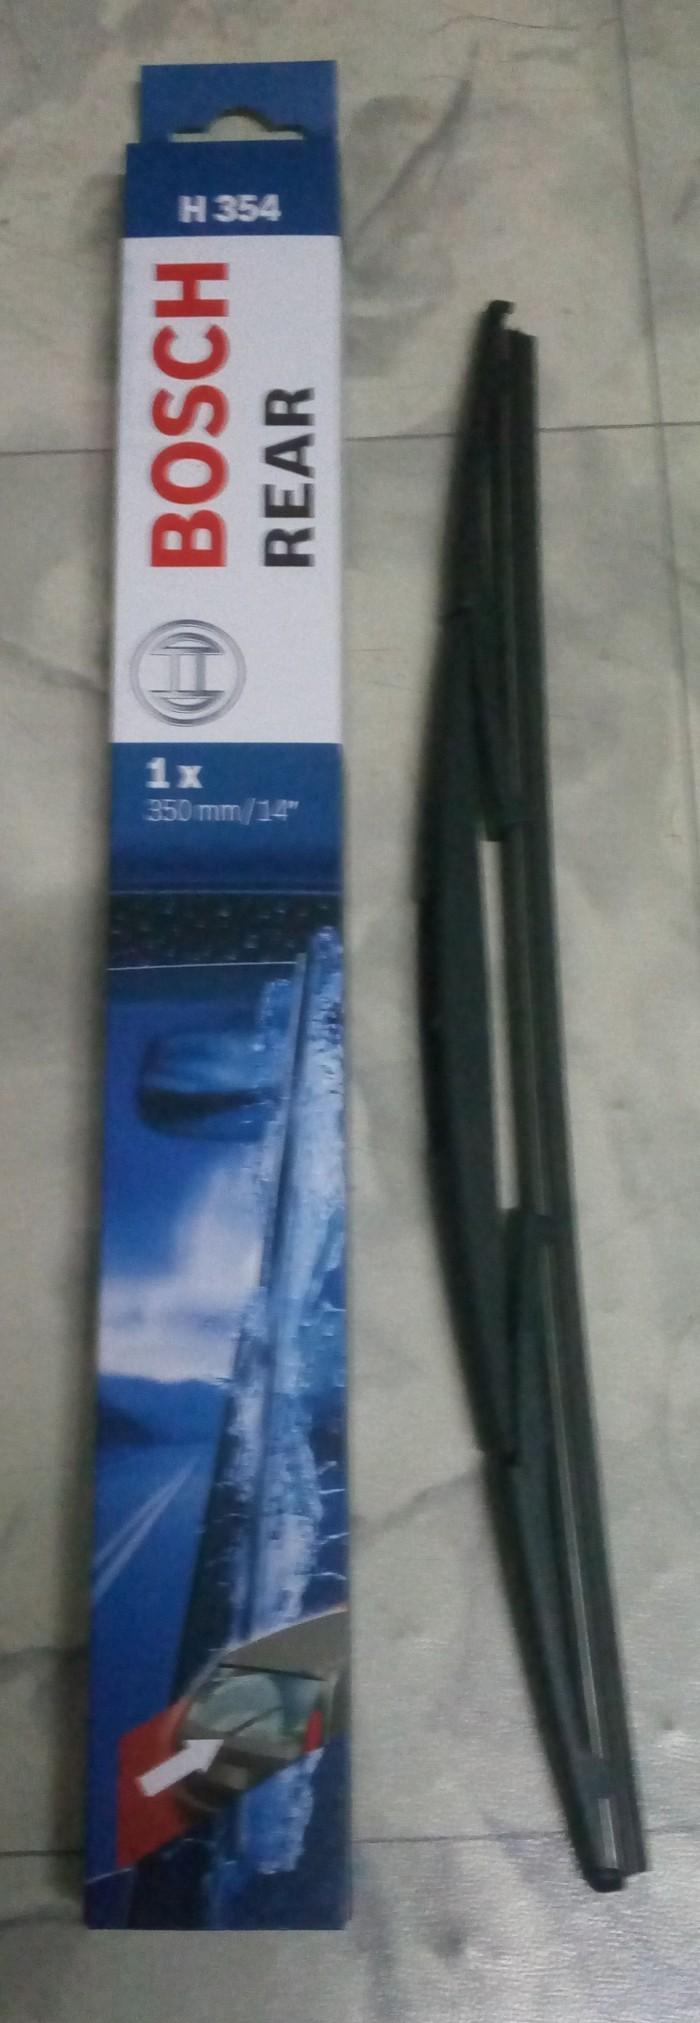 harga Wiper rear bosch / wiper belakang 14inch lock 3 Tokopedia.com